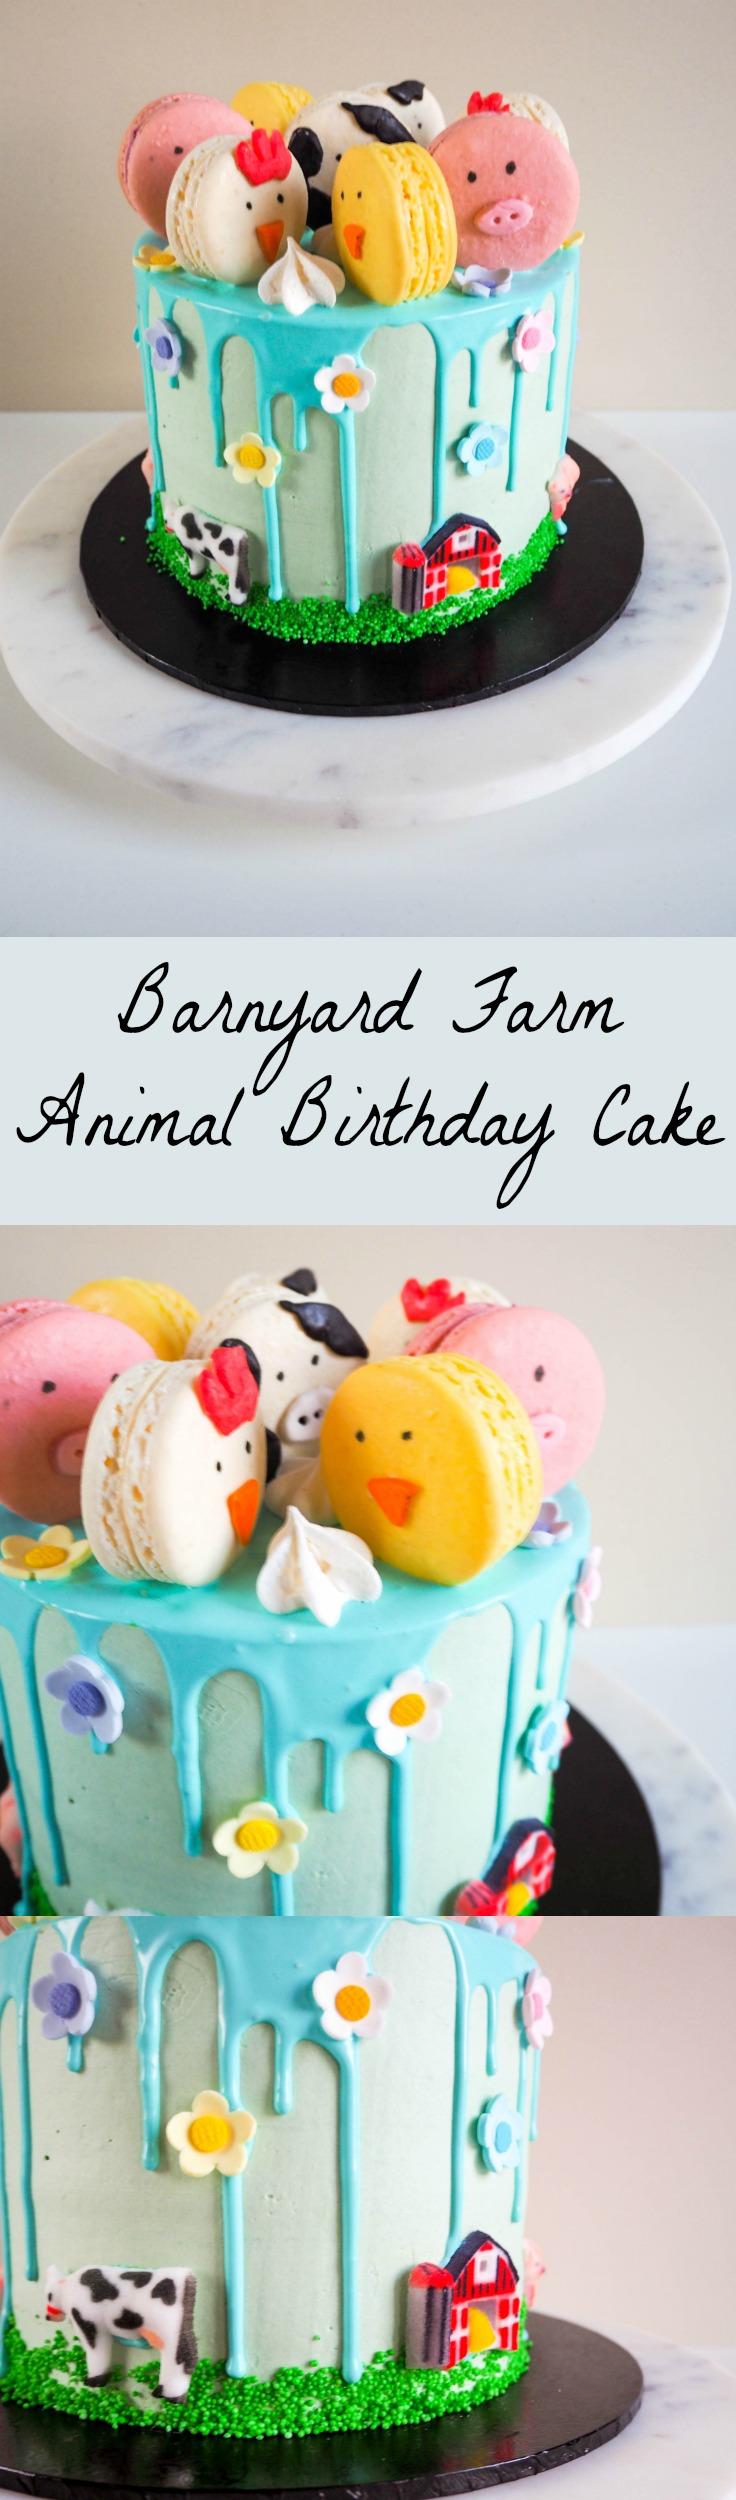 Barnyard Farm Animal Birthday Cake Sweetsbaking Pinterest